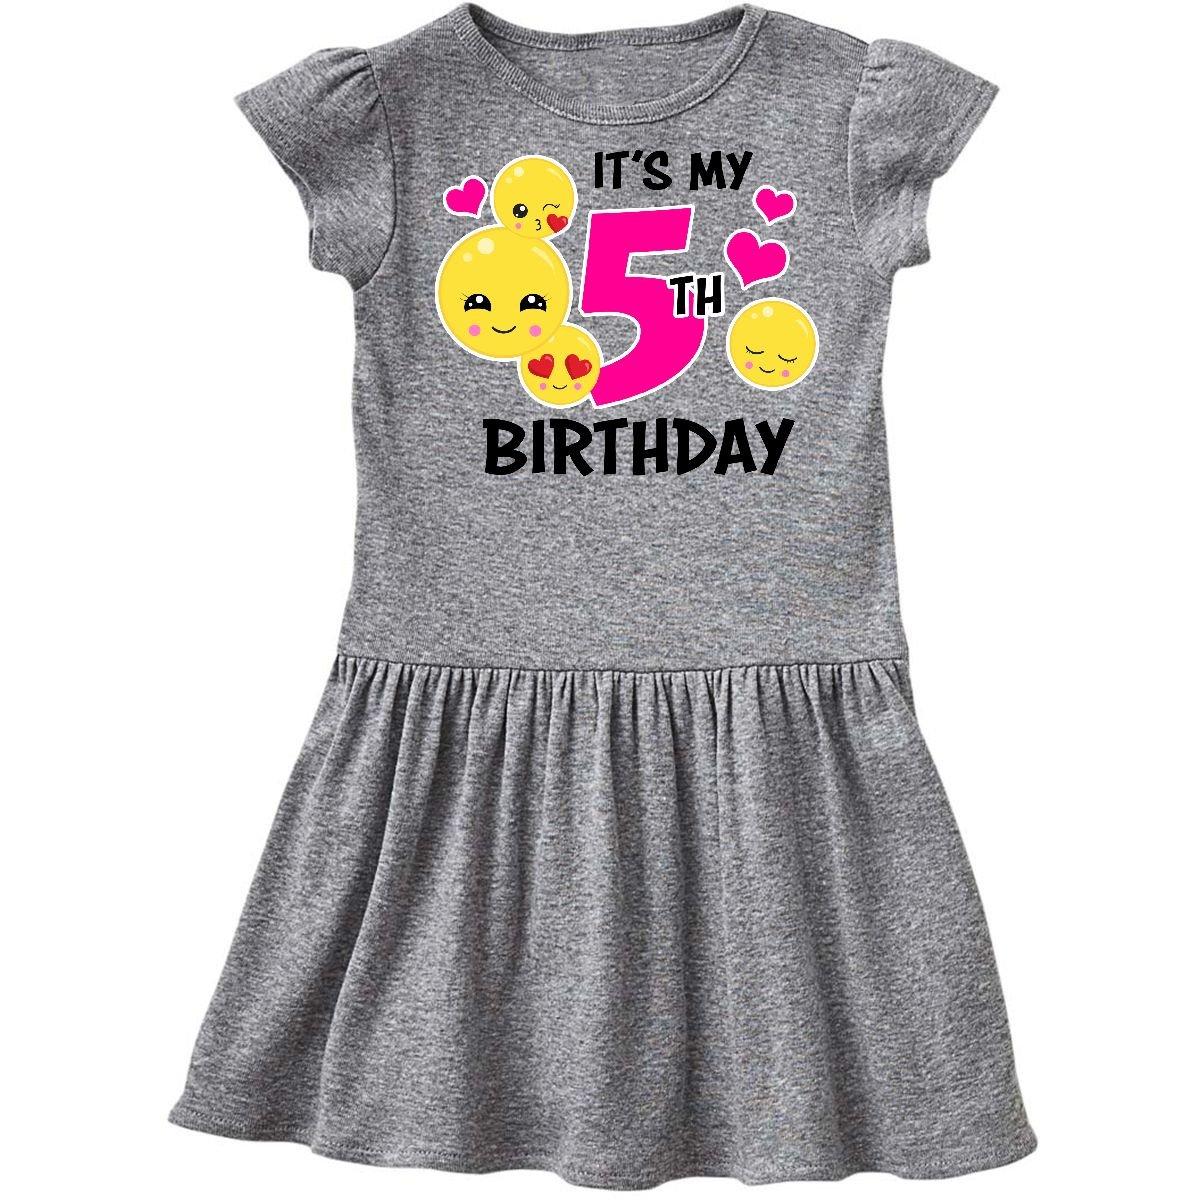 d9f121e7401 inktastic - Its My 5th Birthday Emojis Toddler Dress 14-196261-198 ...